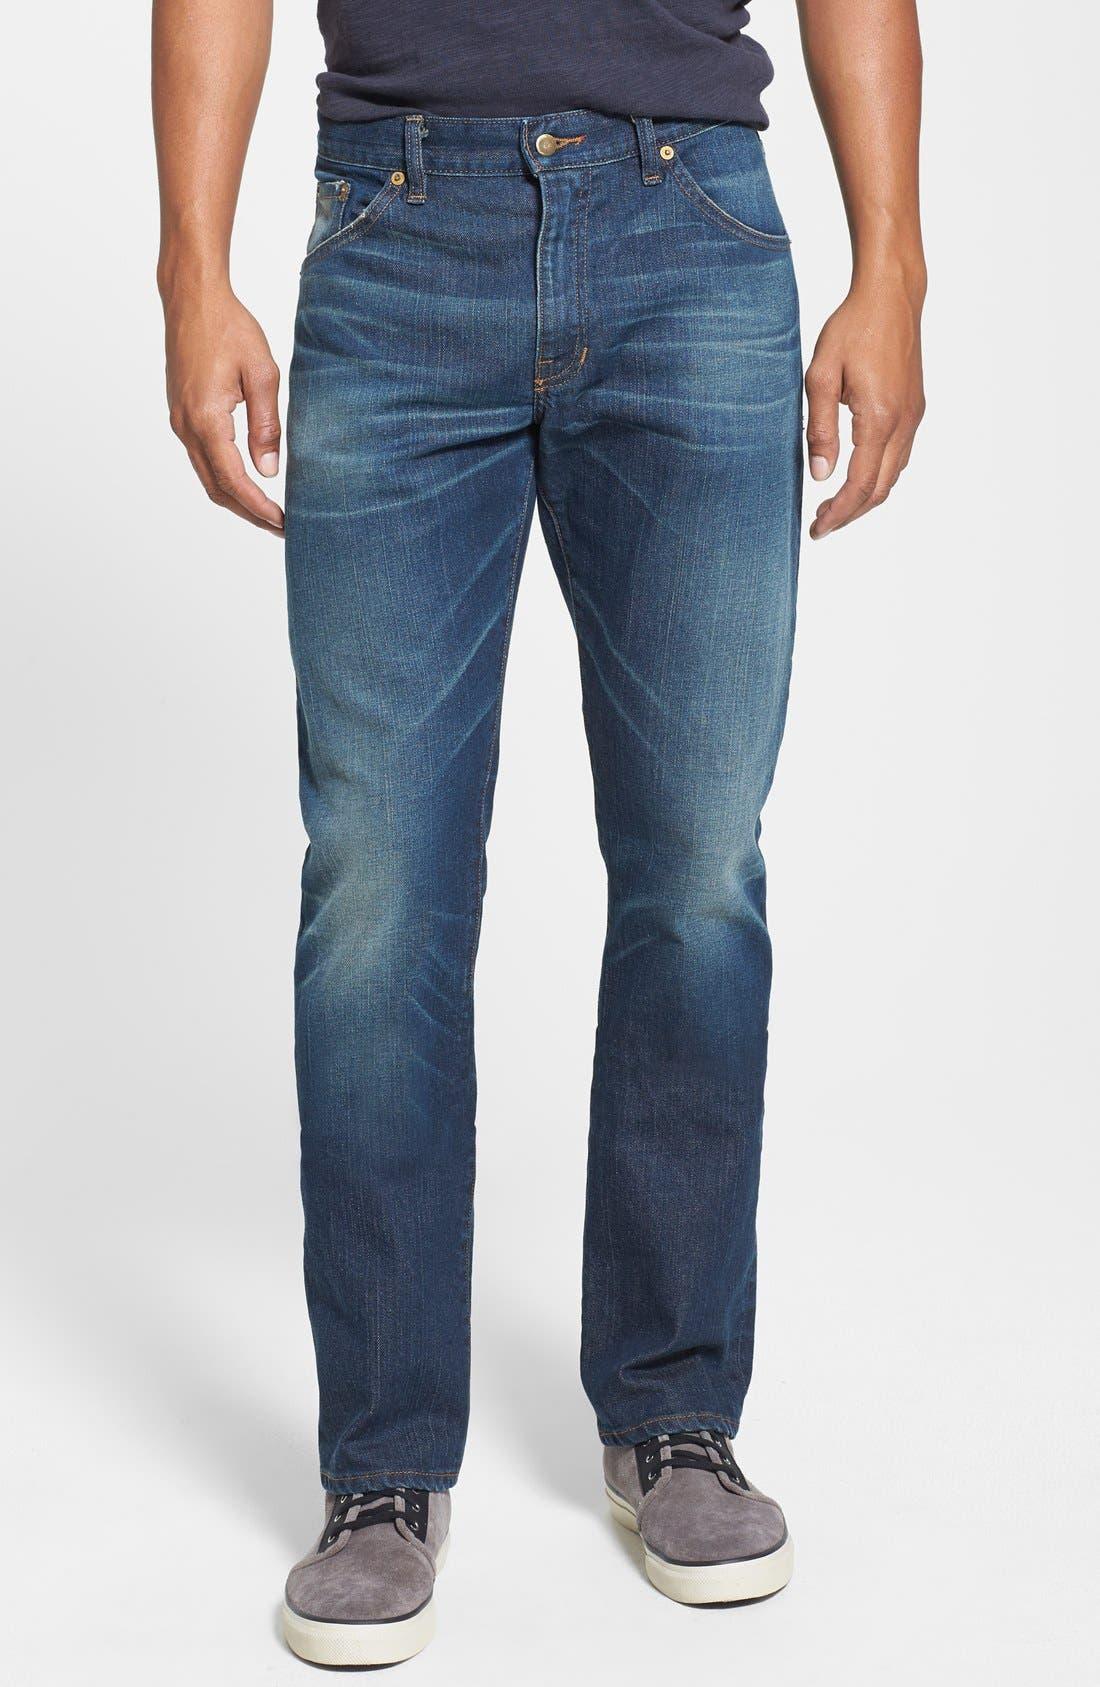 Main Image - Raleigh Denim 'Jones' Slim Straight Fit Jeans (Camp)